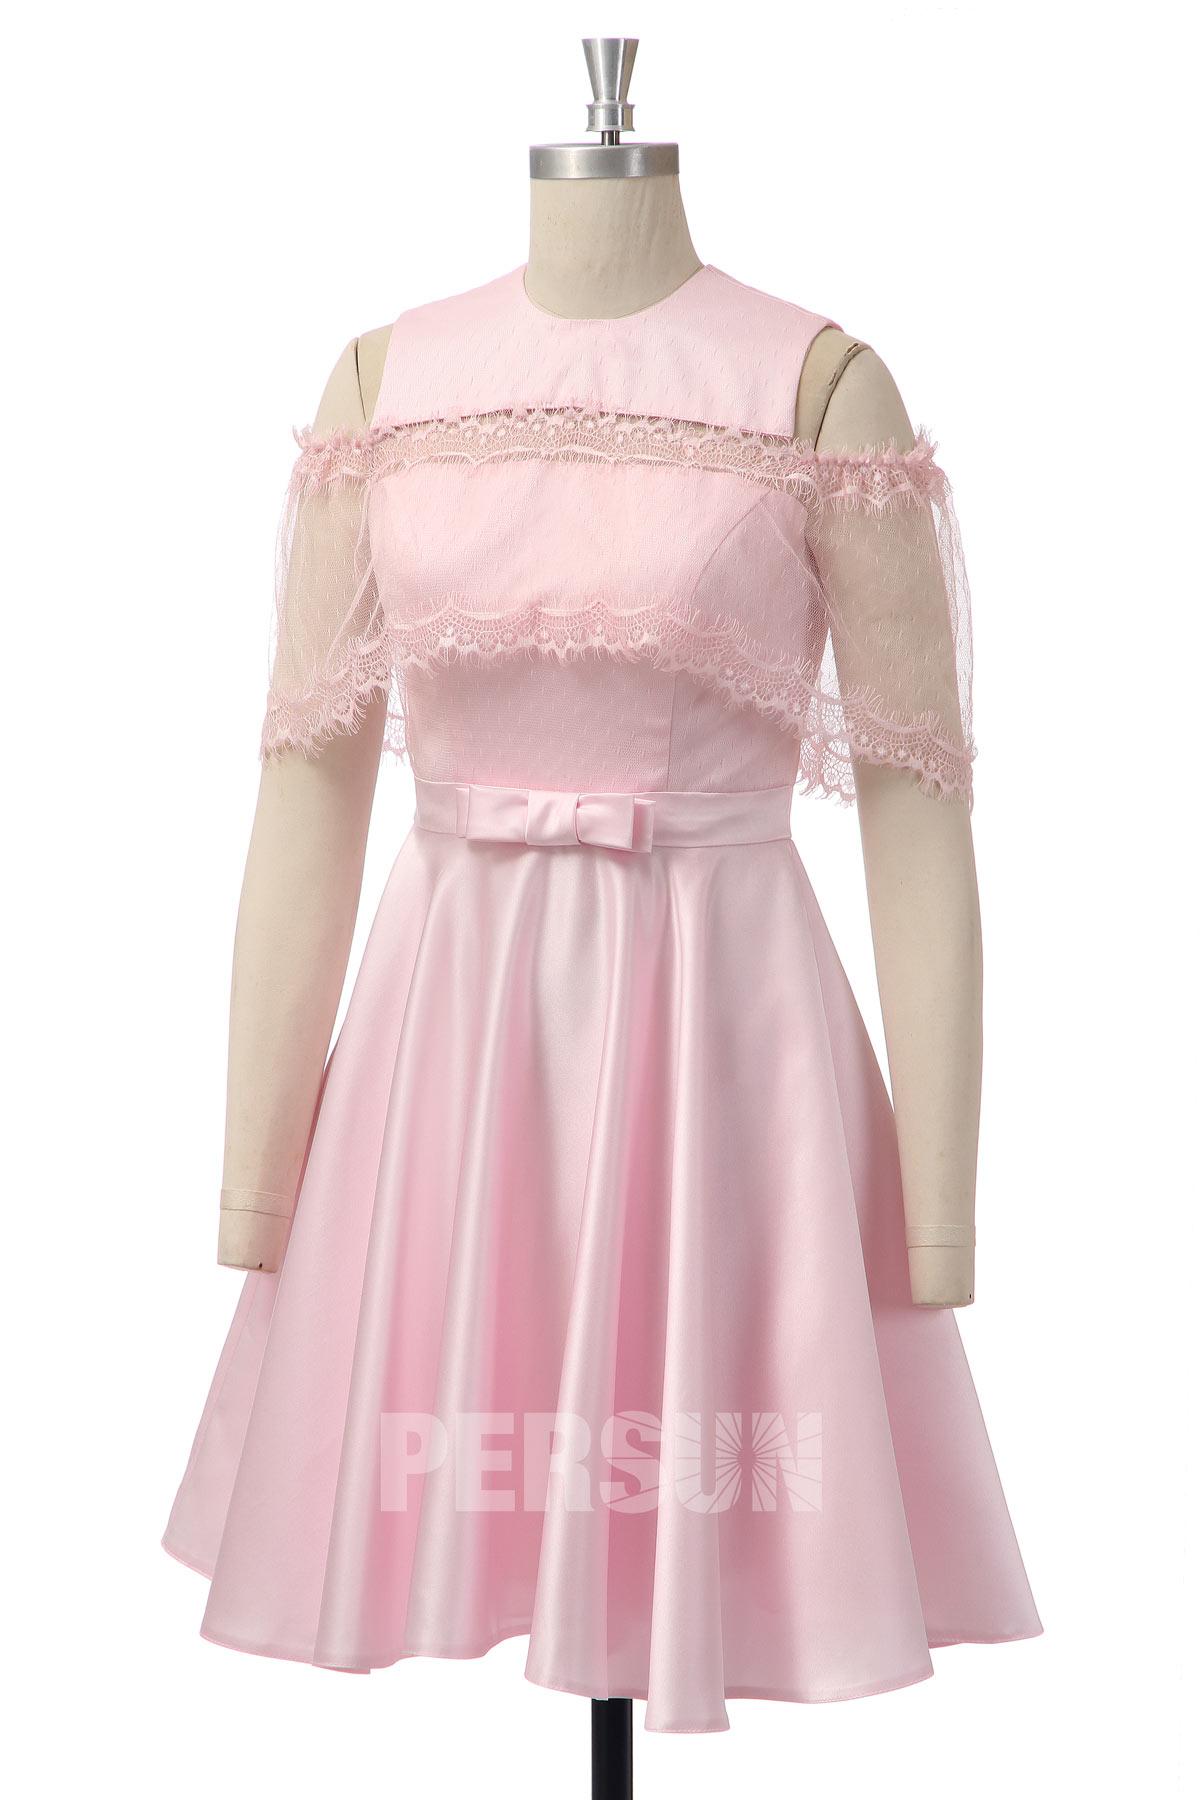 robe de cocktail rose 2020